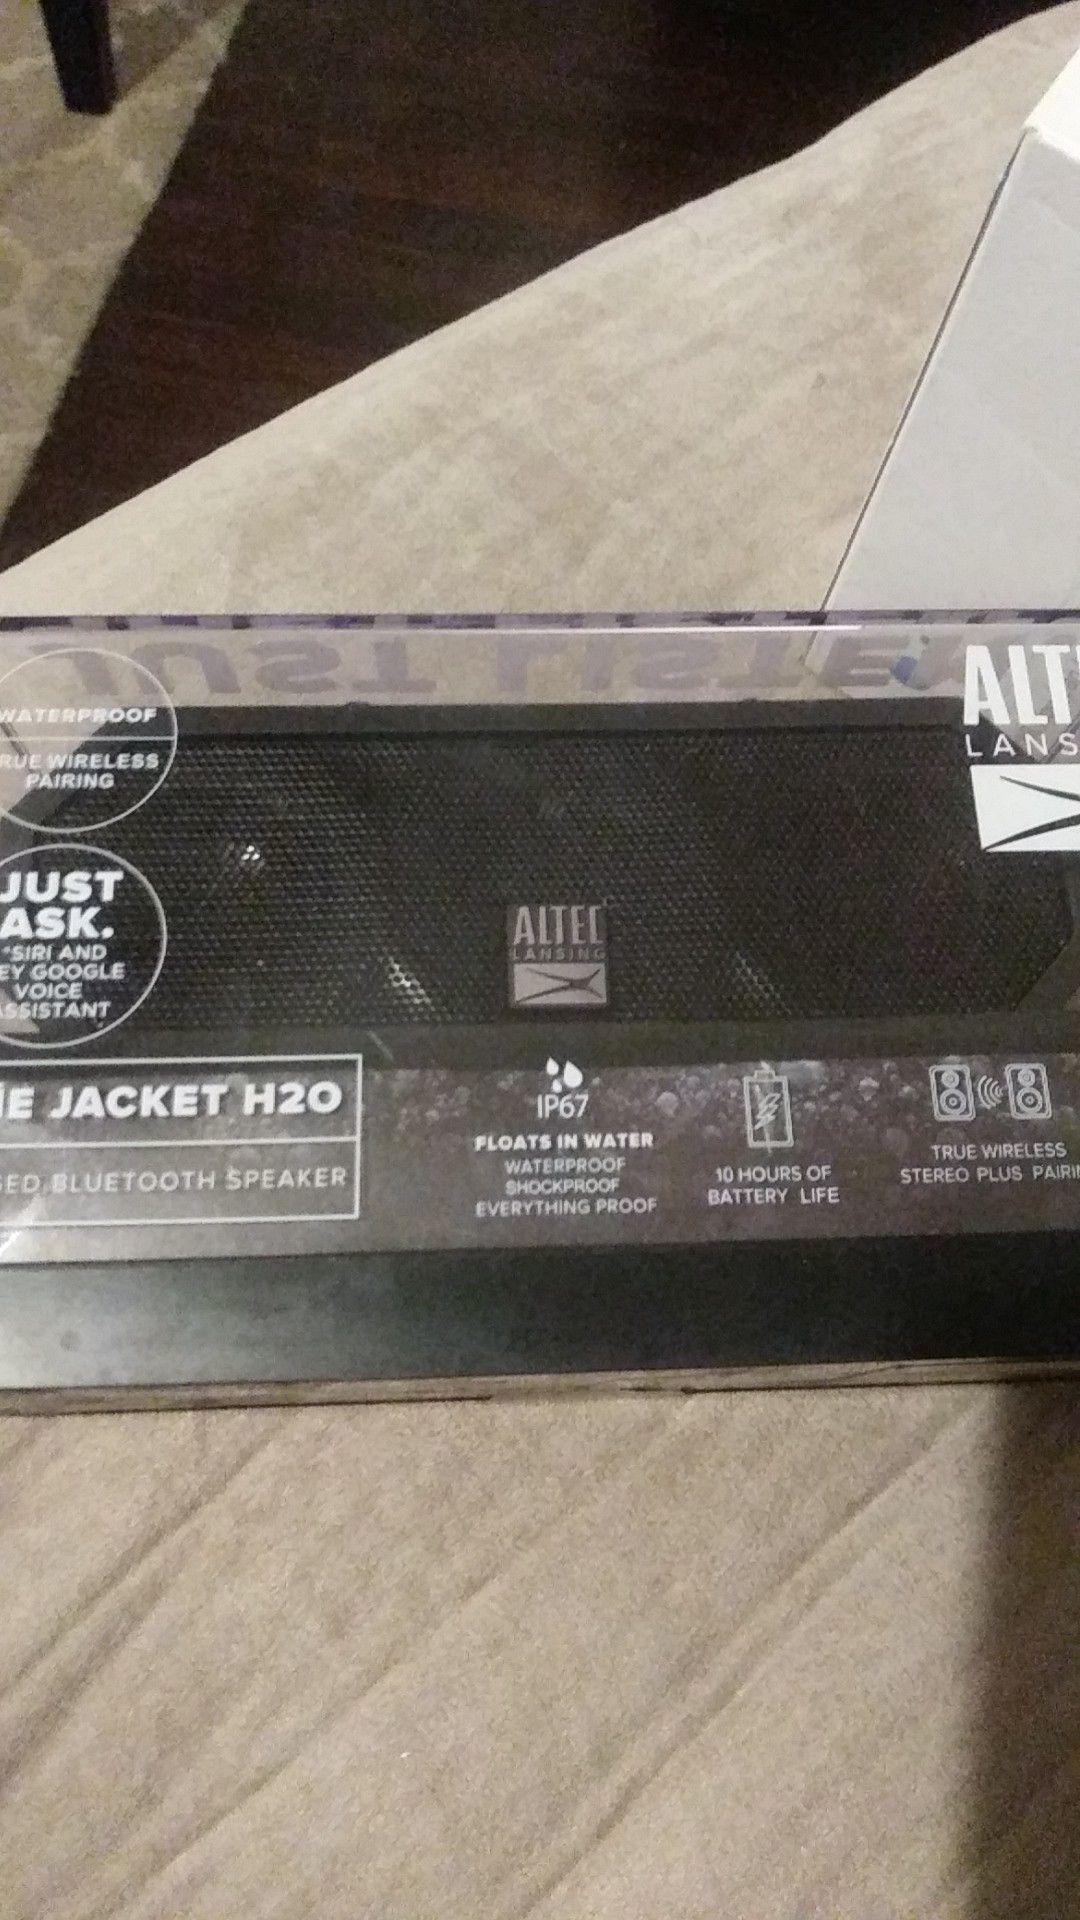 Altec the jacket H20 Bluetooth speaker